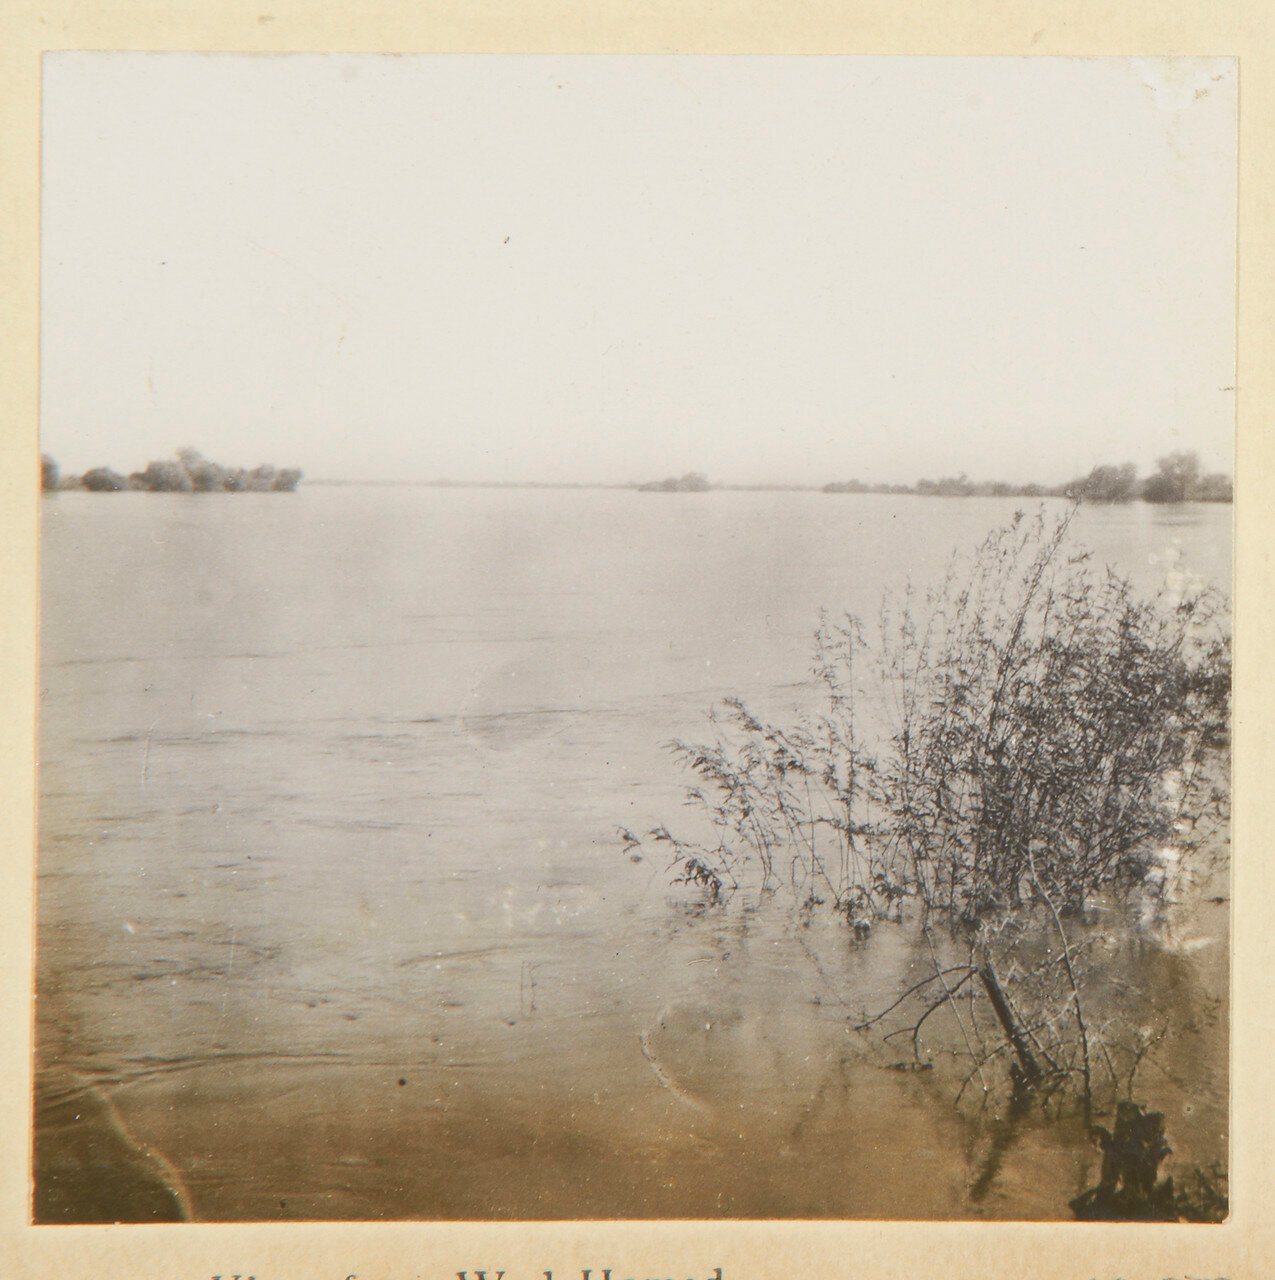 20-25 августа 1898. Вид из Вад Хамида